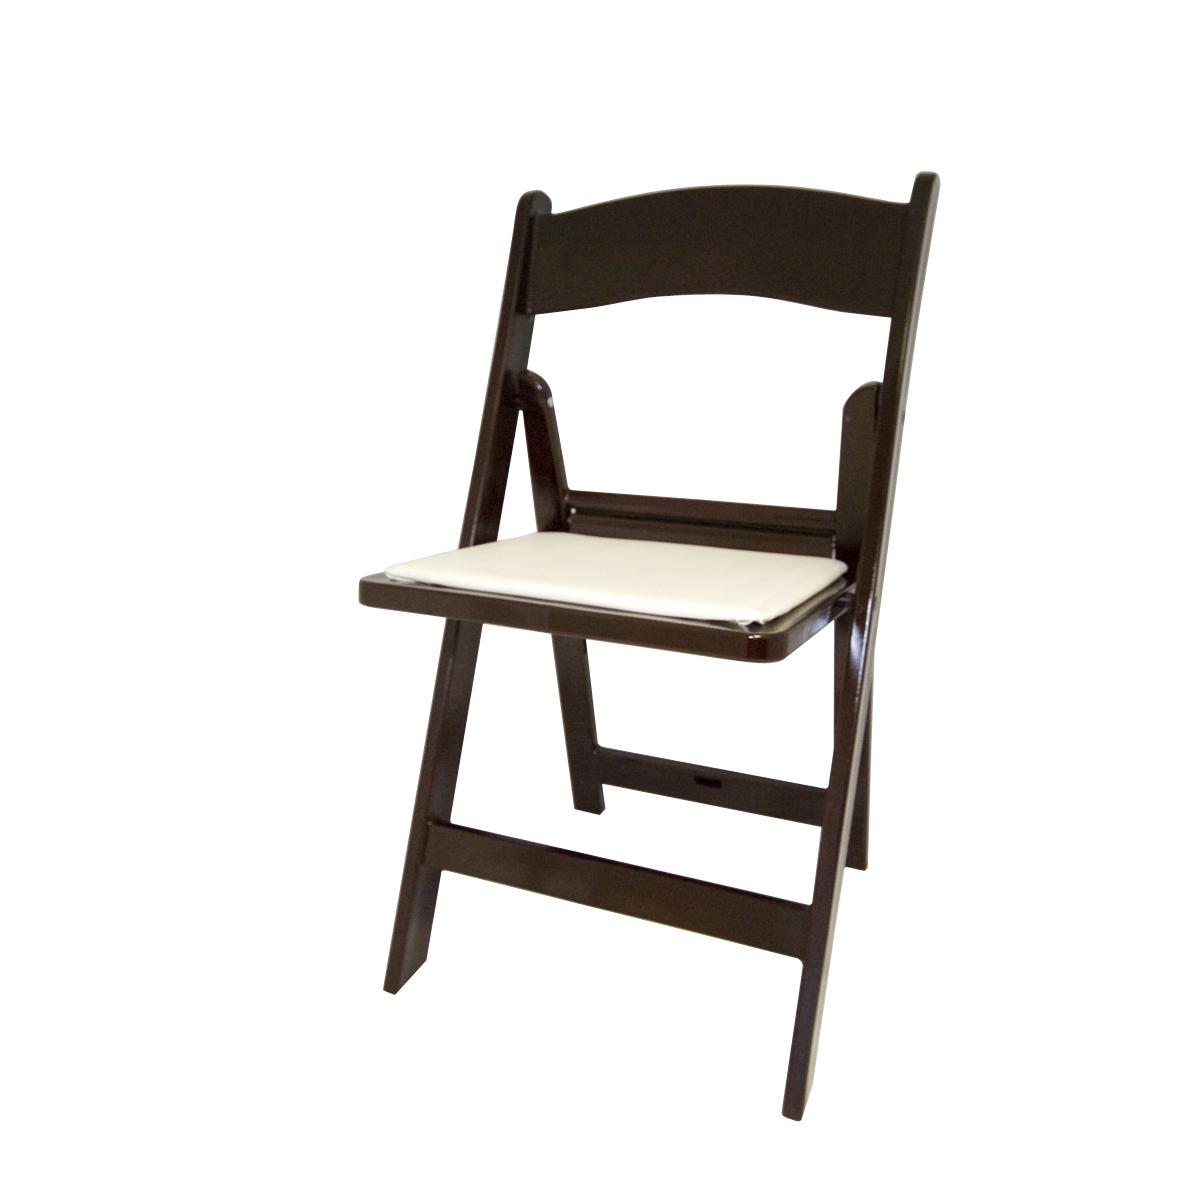 Mahogany Folding Chair with Ivory Cusion